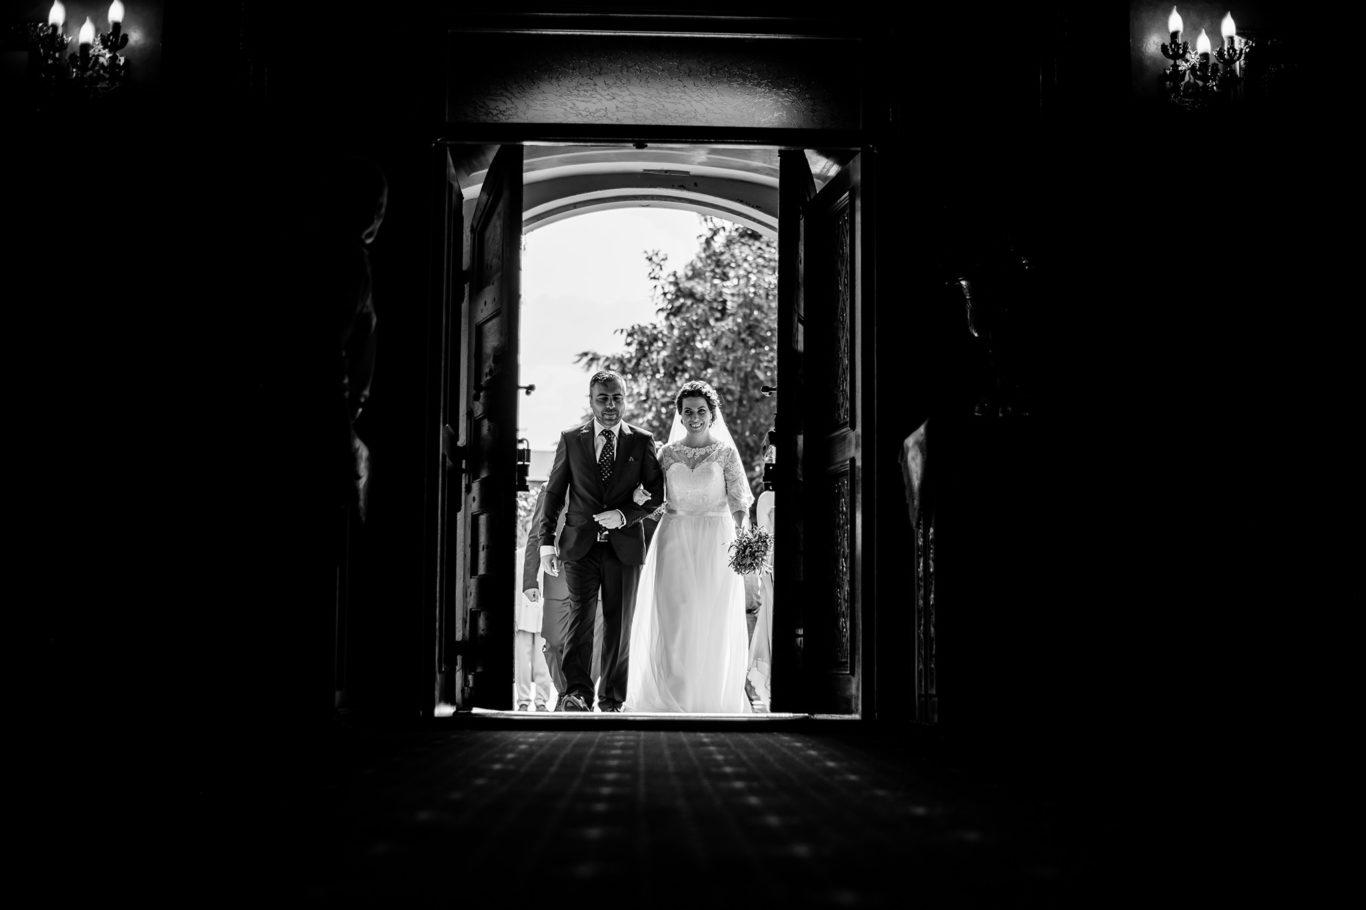 0382-fotografie-nunta-bucuresti-anca-george-fotograf-ciprian-dumitrescu-dsc_8559